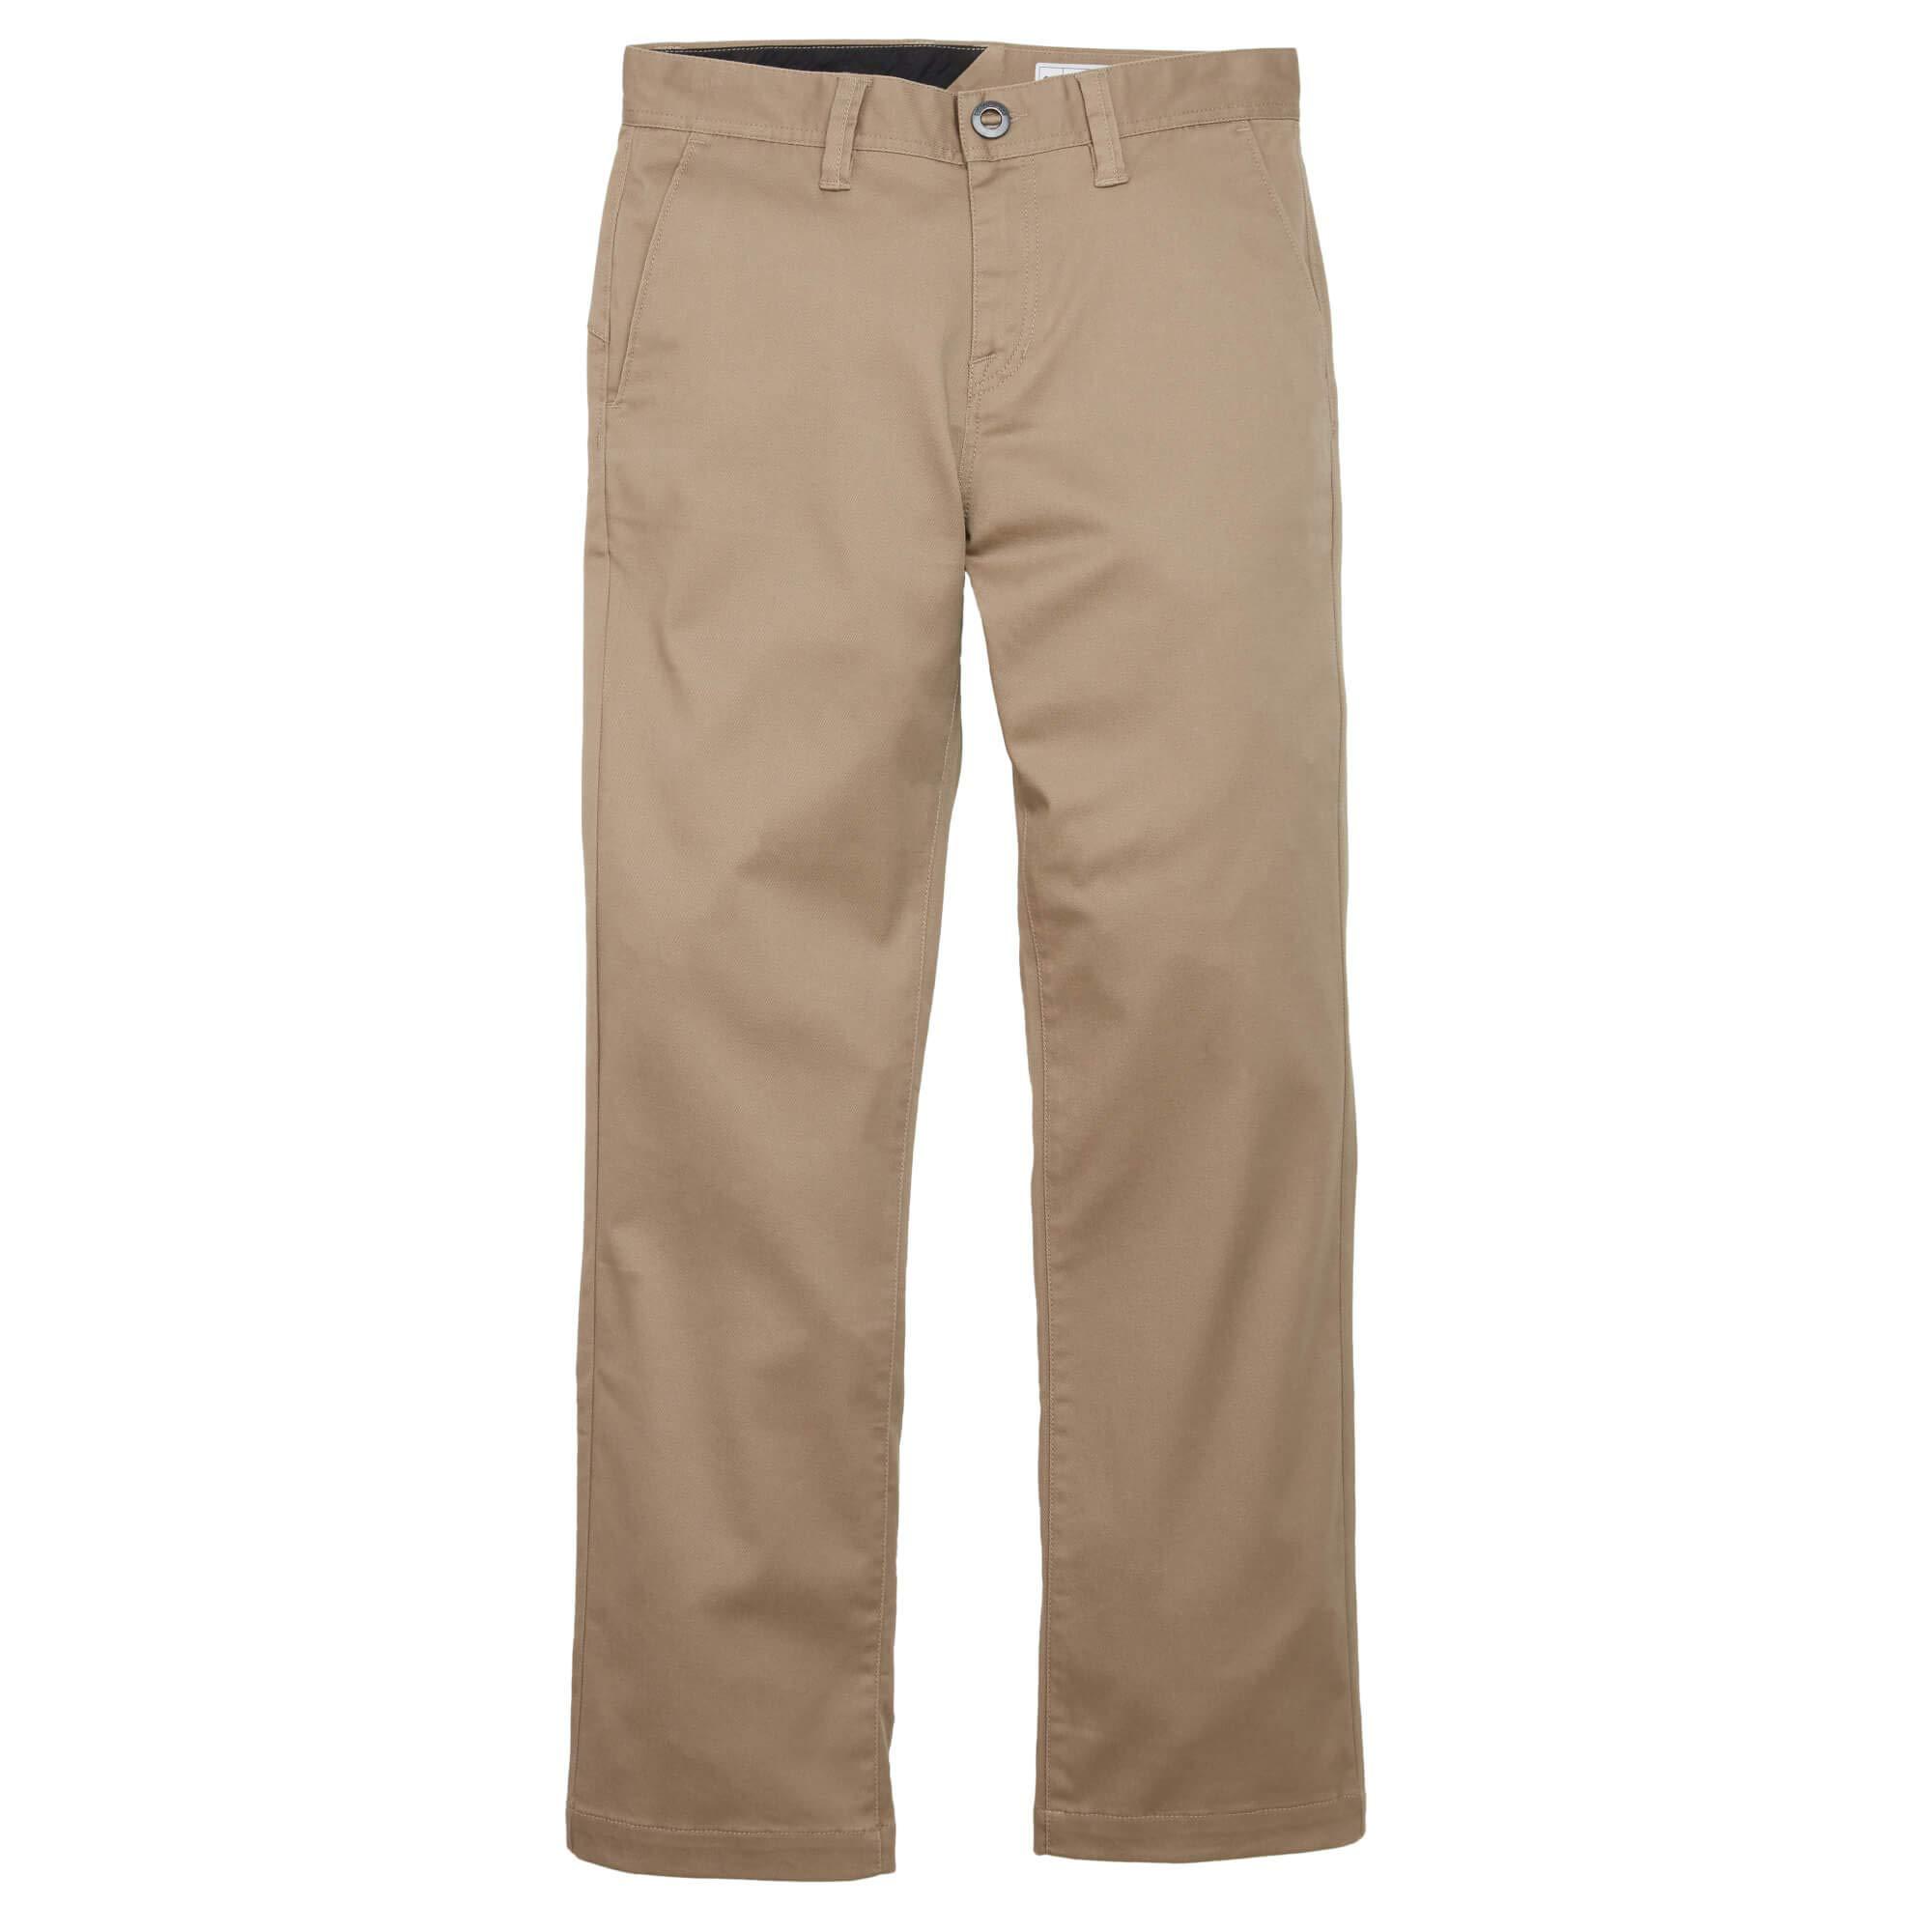 Volcom Big Boys Frickin Regular Fit 15'' Chino Pant, Khaki, 23 by Volcom (Image #1)